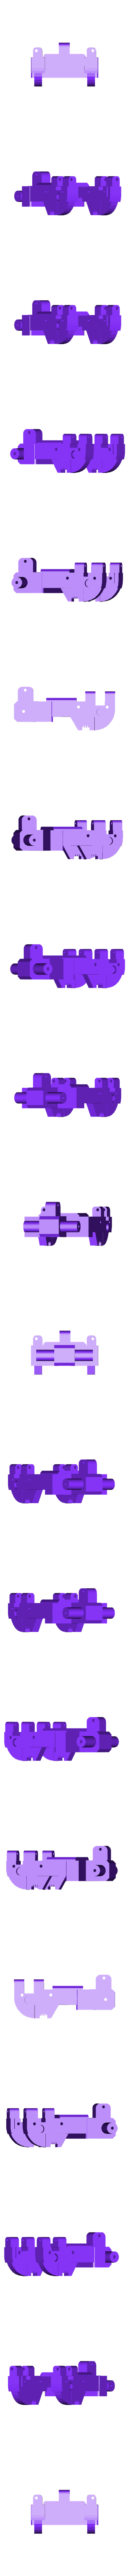 4- G1 ALLICON- NEW BASE.stl Download STL file Transformers G1 Allicon (11cm Scale) • 3D print object, mmshightail